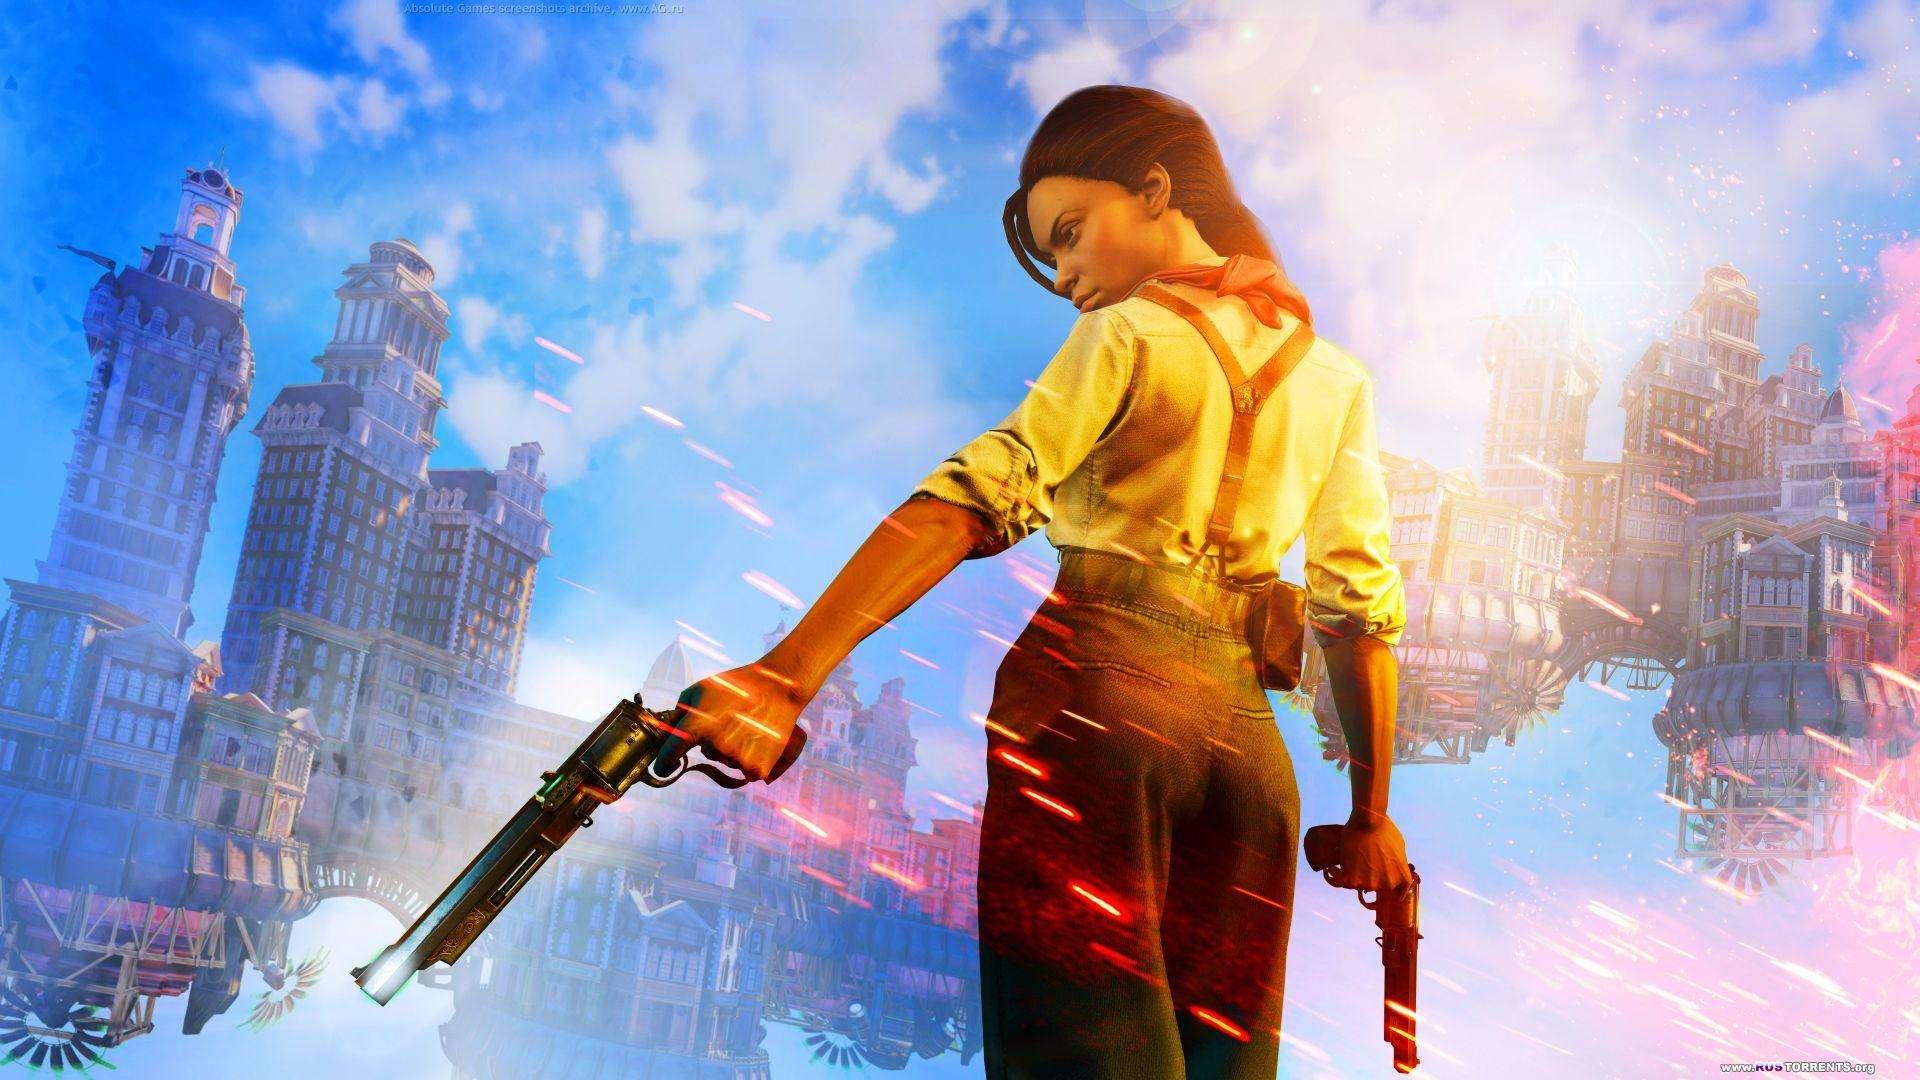 BioShock Infinite [v 1.1.25.5165 + DLC] | PC | Repack от z10yded